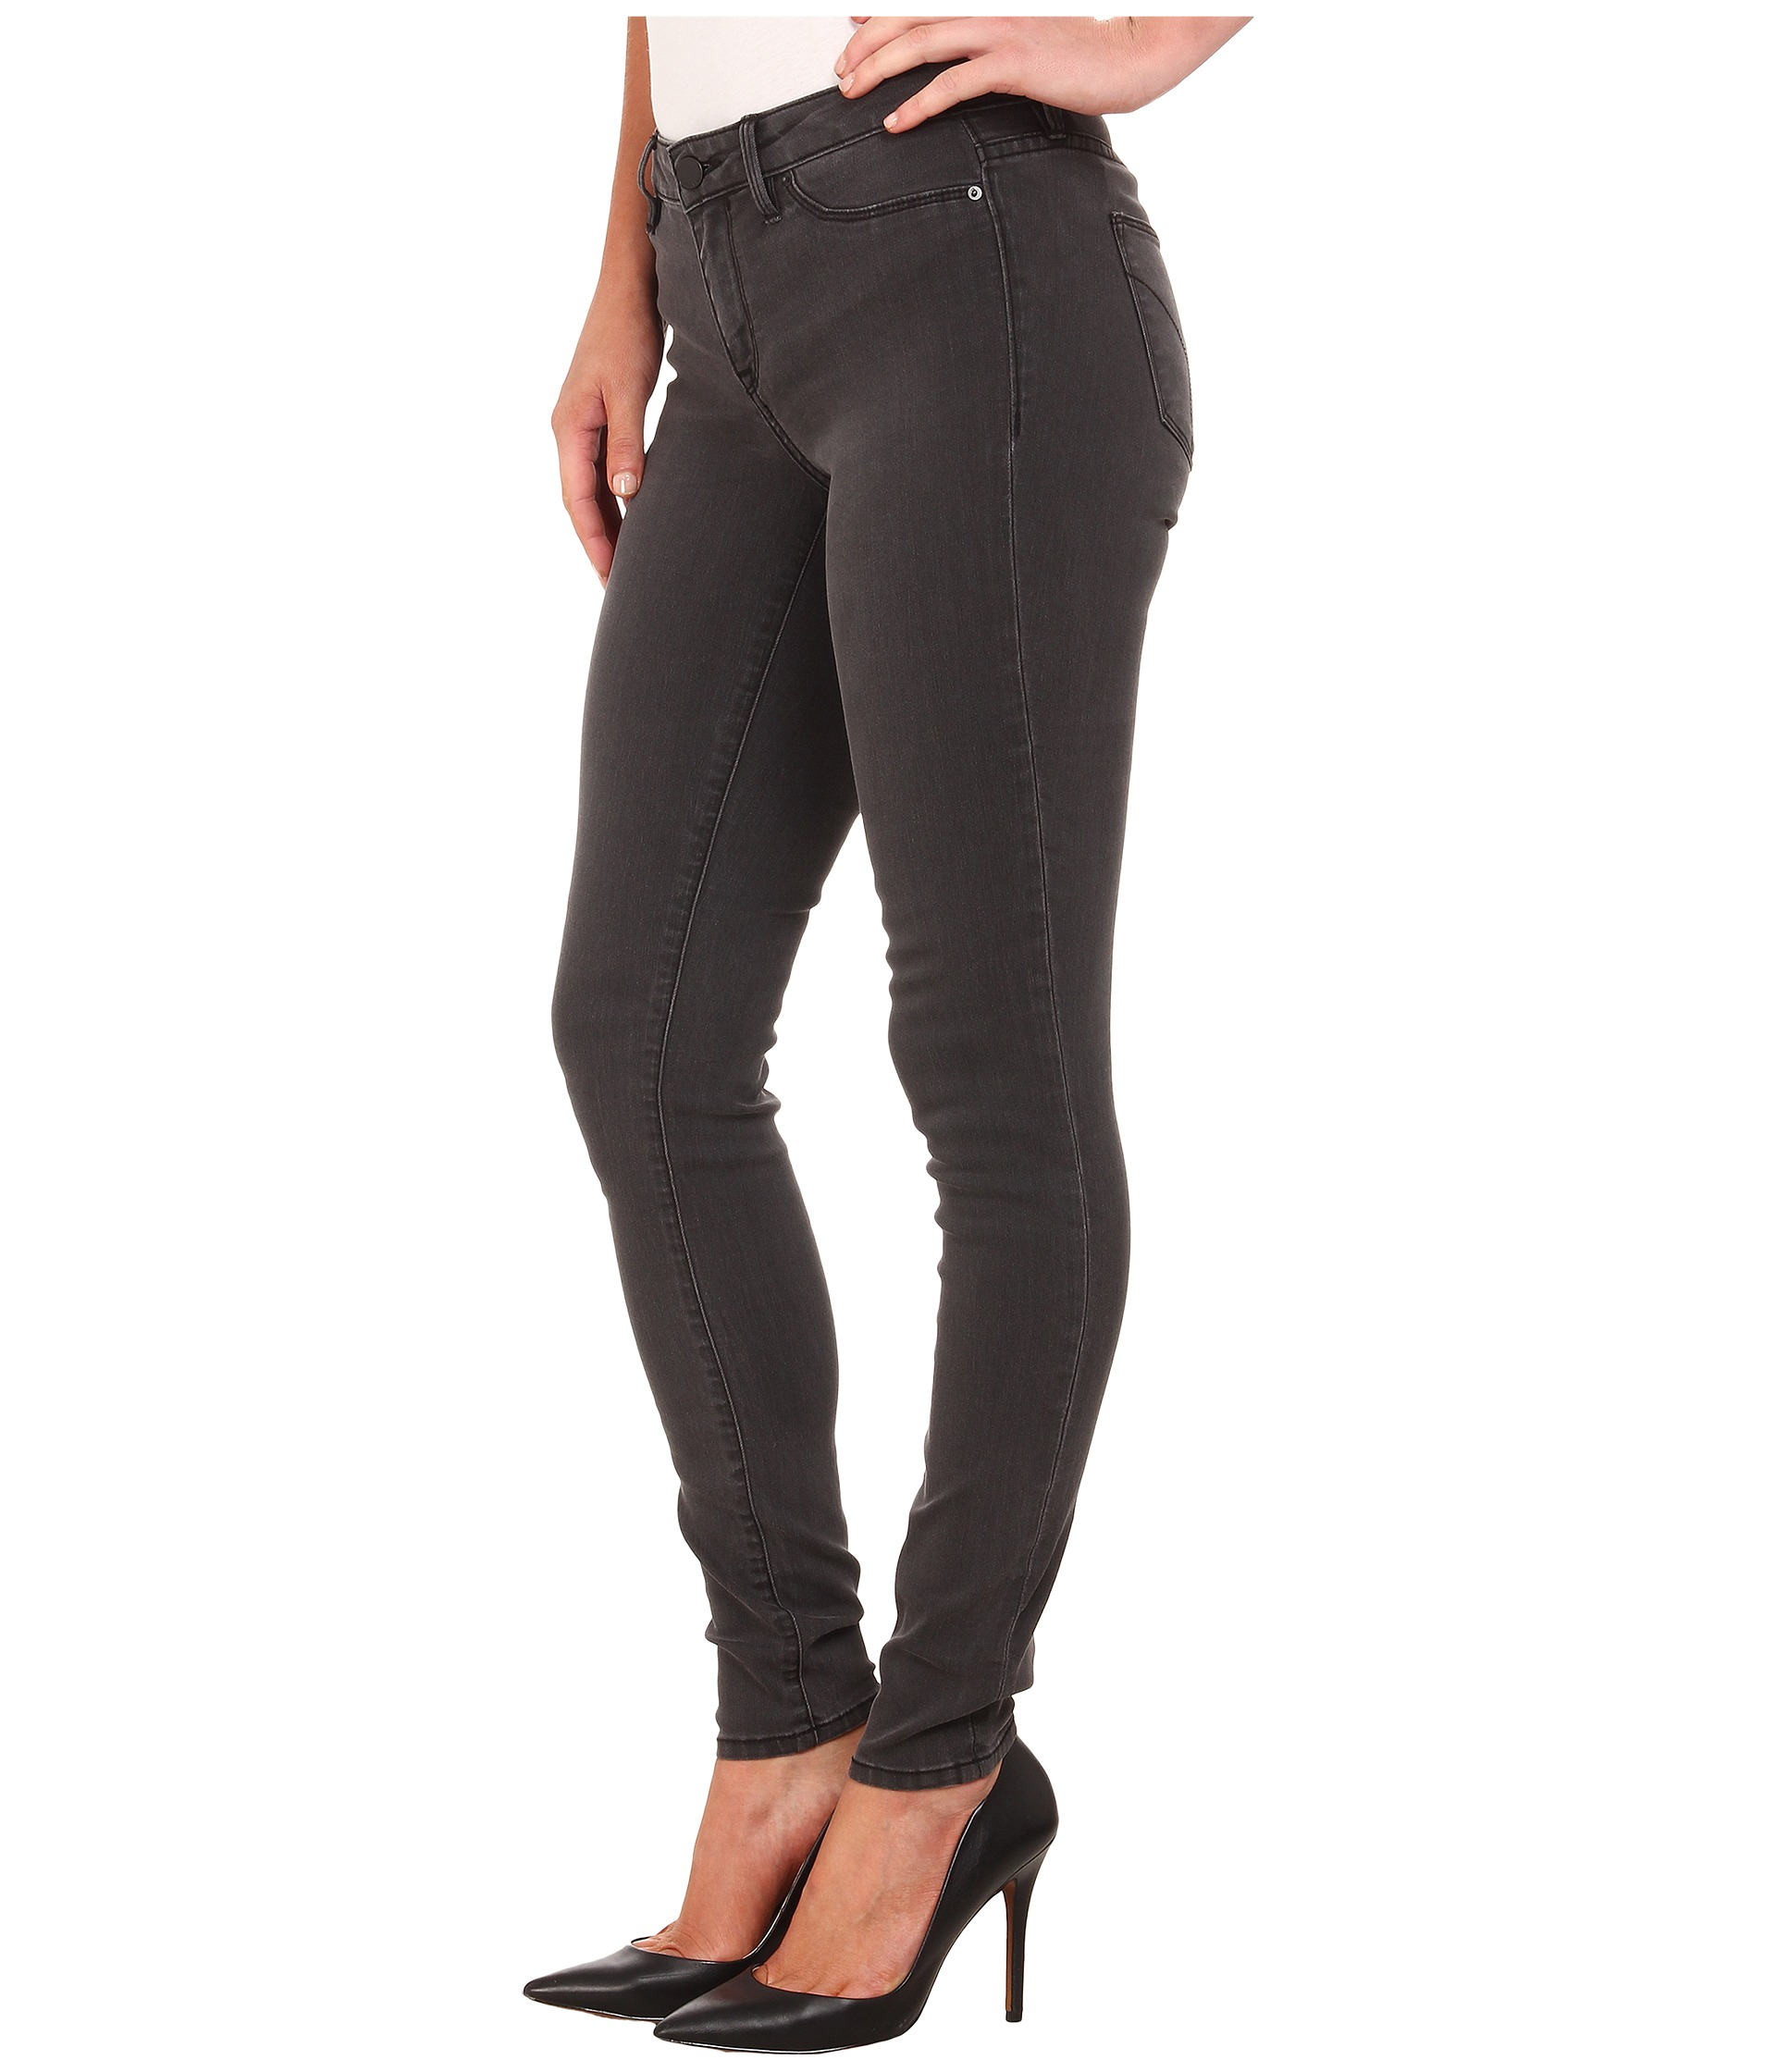 calvin klein jeans denim leggings in washed down grey free shipping both ways. Black Bedroom Furniture Sets. Home Design Ideas